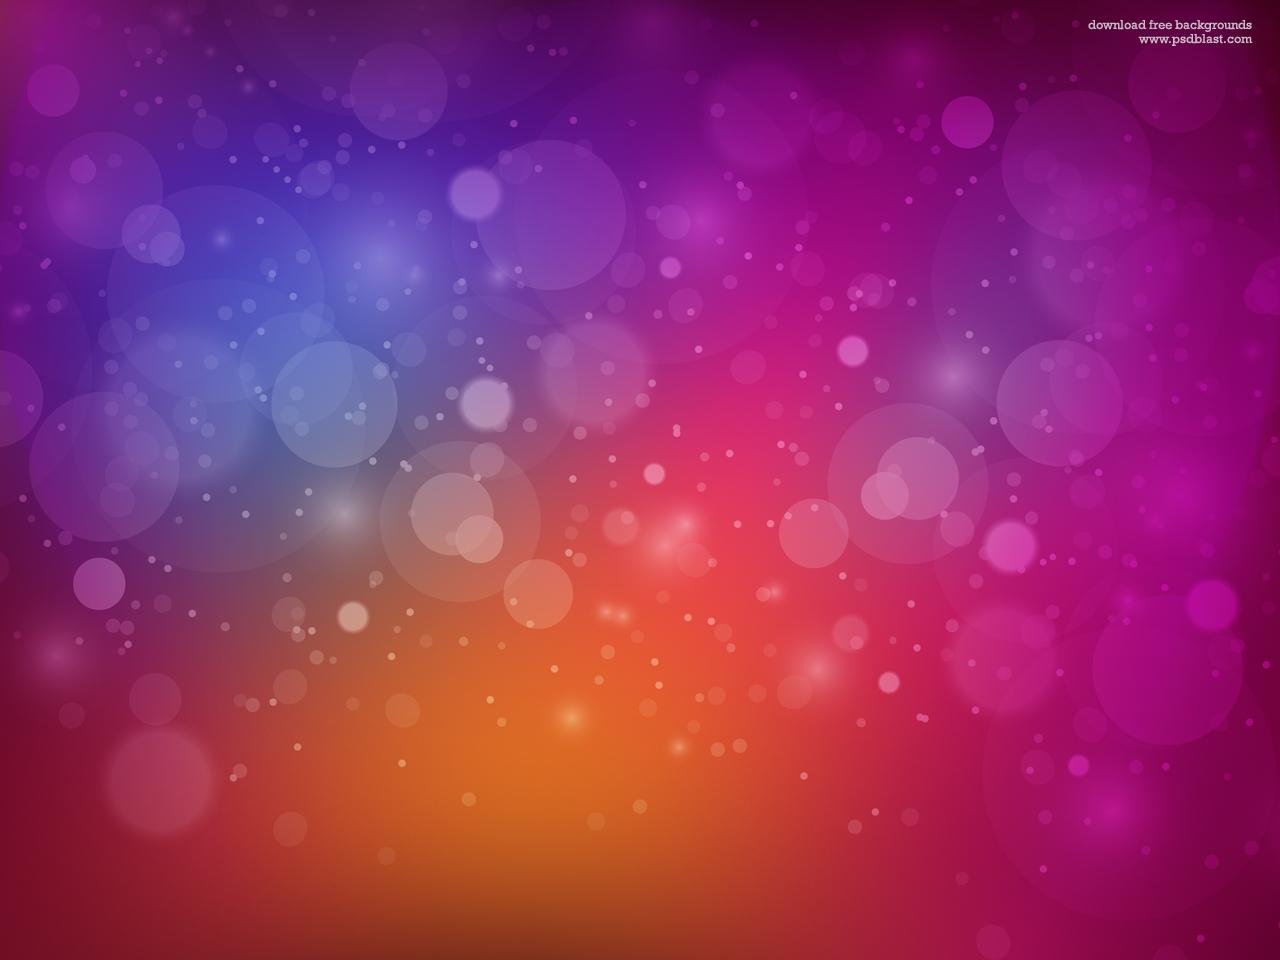 colorful background psdblast